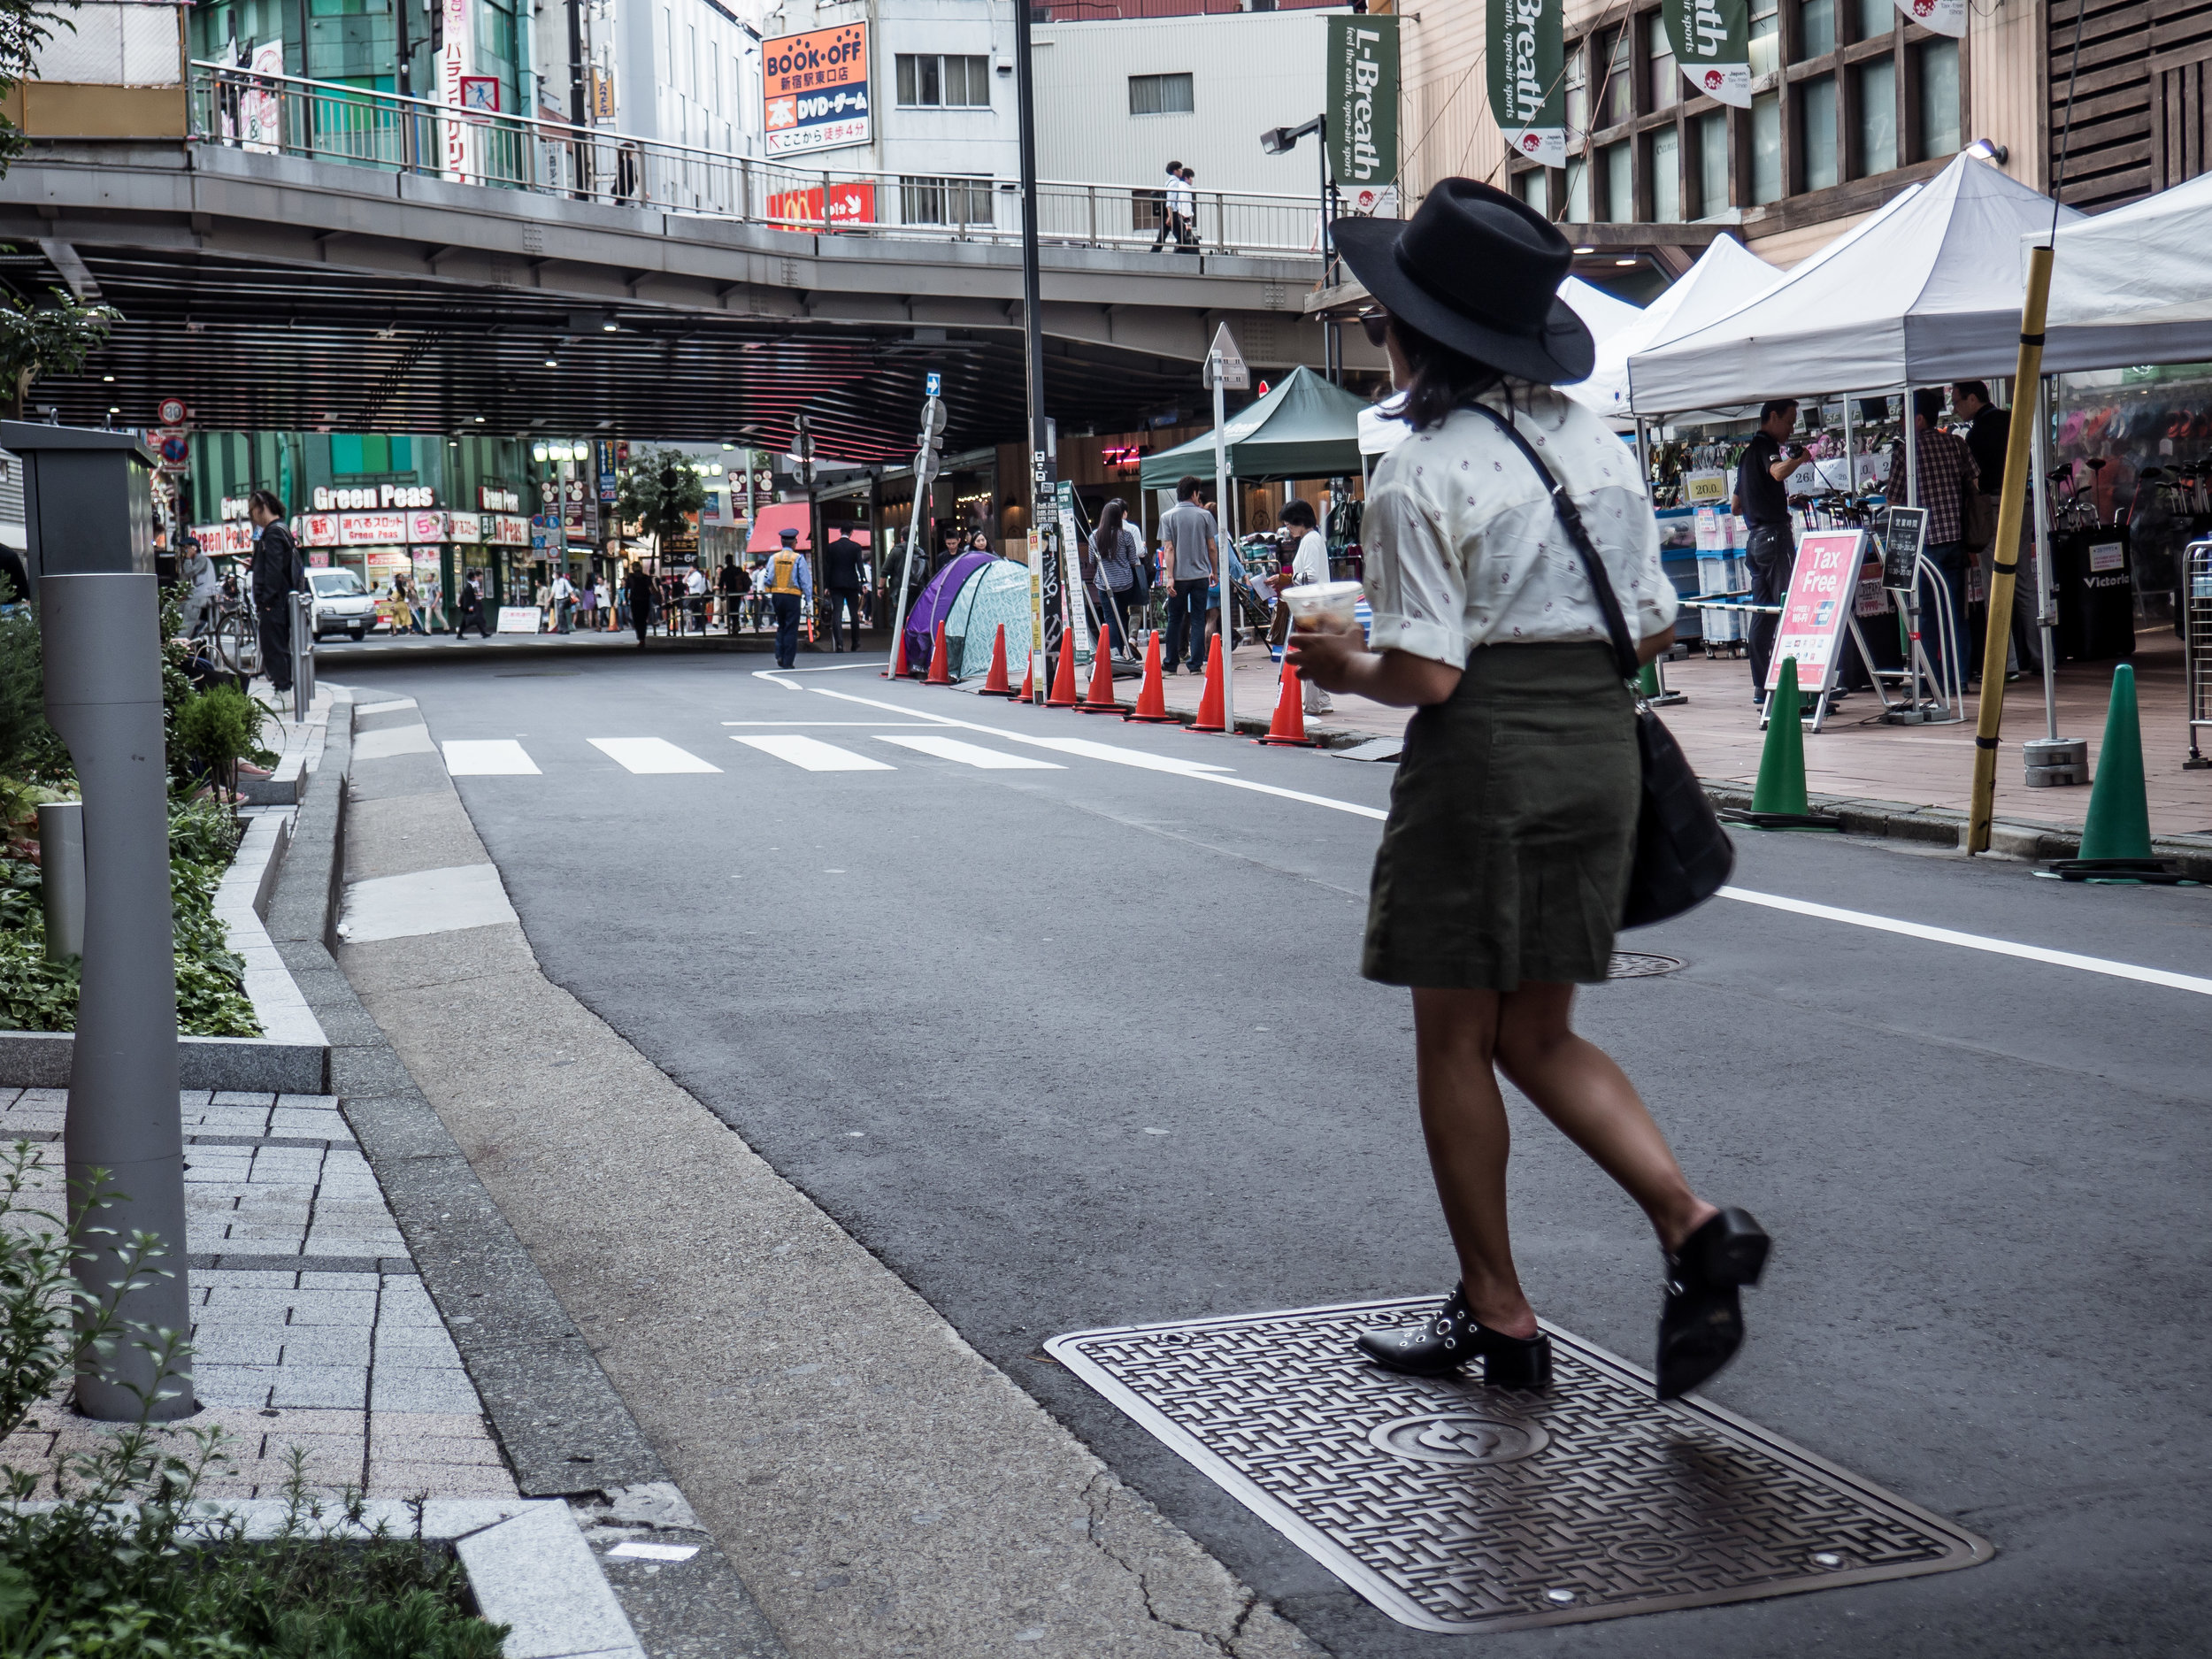 Knot Sisters Future is Female Shirt in Shinjuku